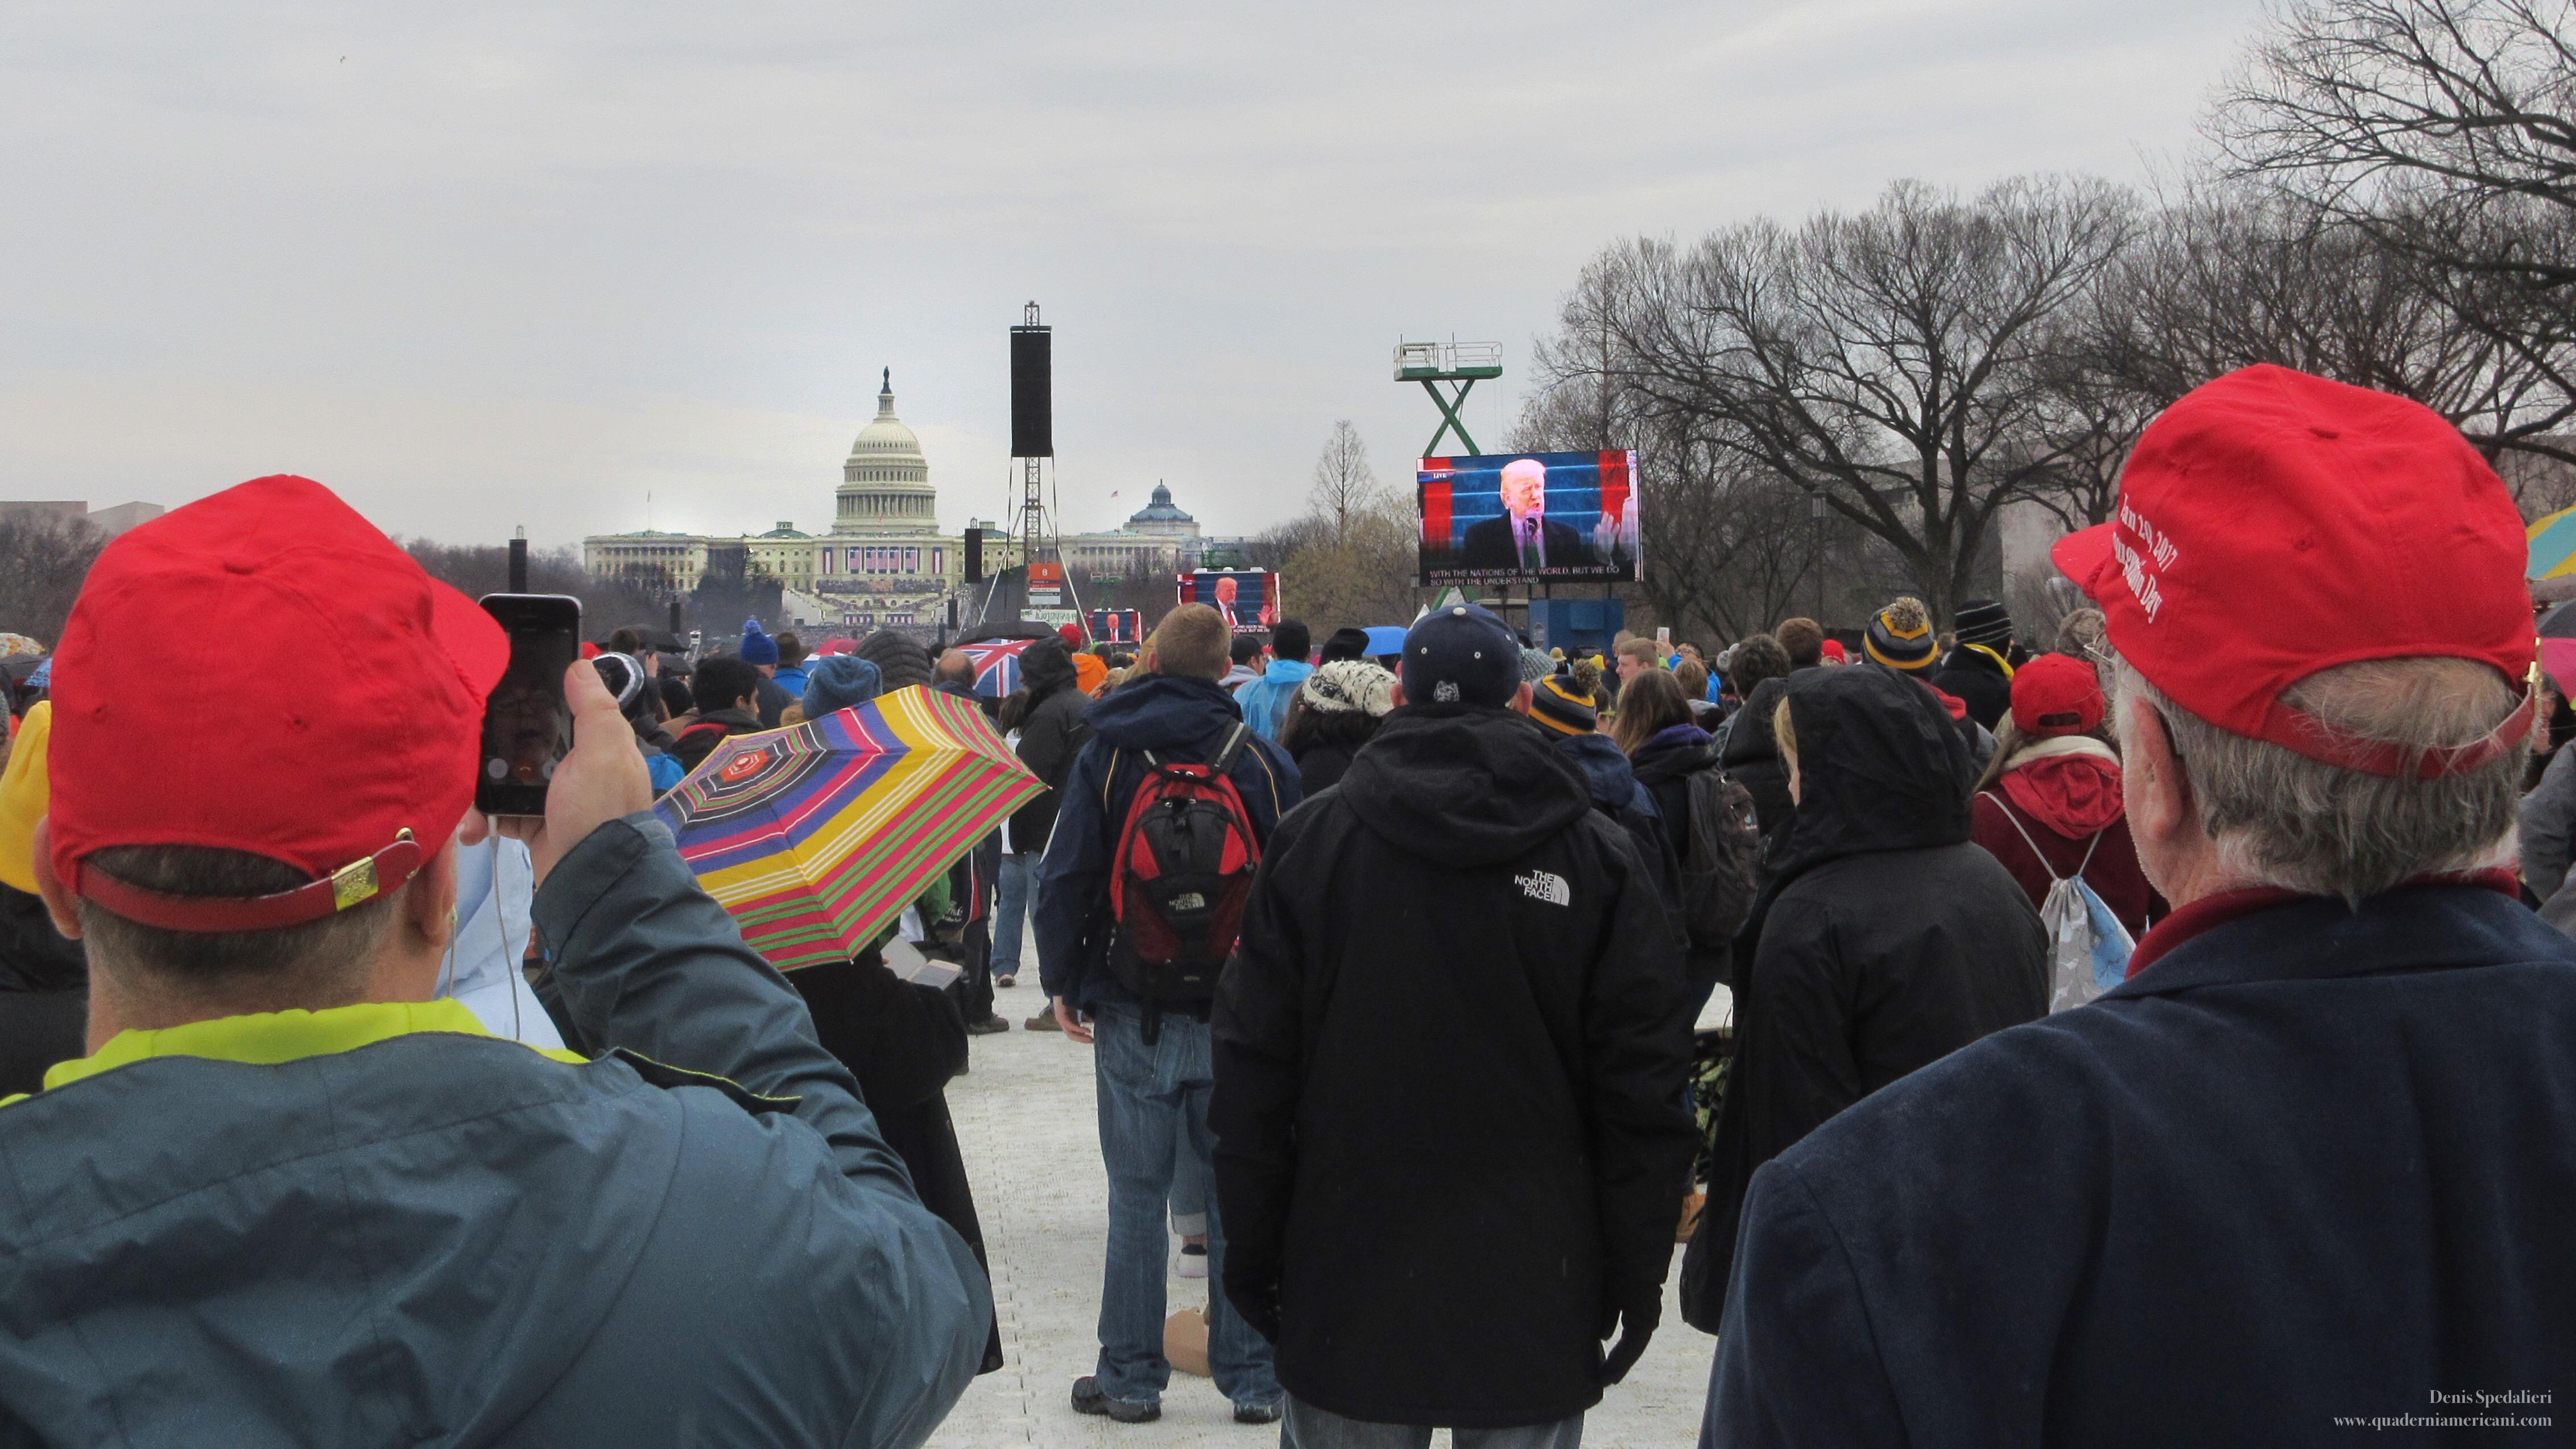 Trump, Donald Trump, Inauguration Day, Inauguration 2017, Washington, D.C.